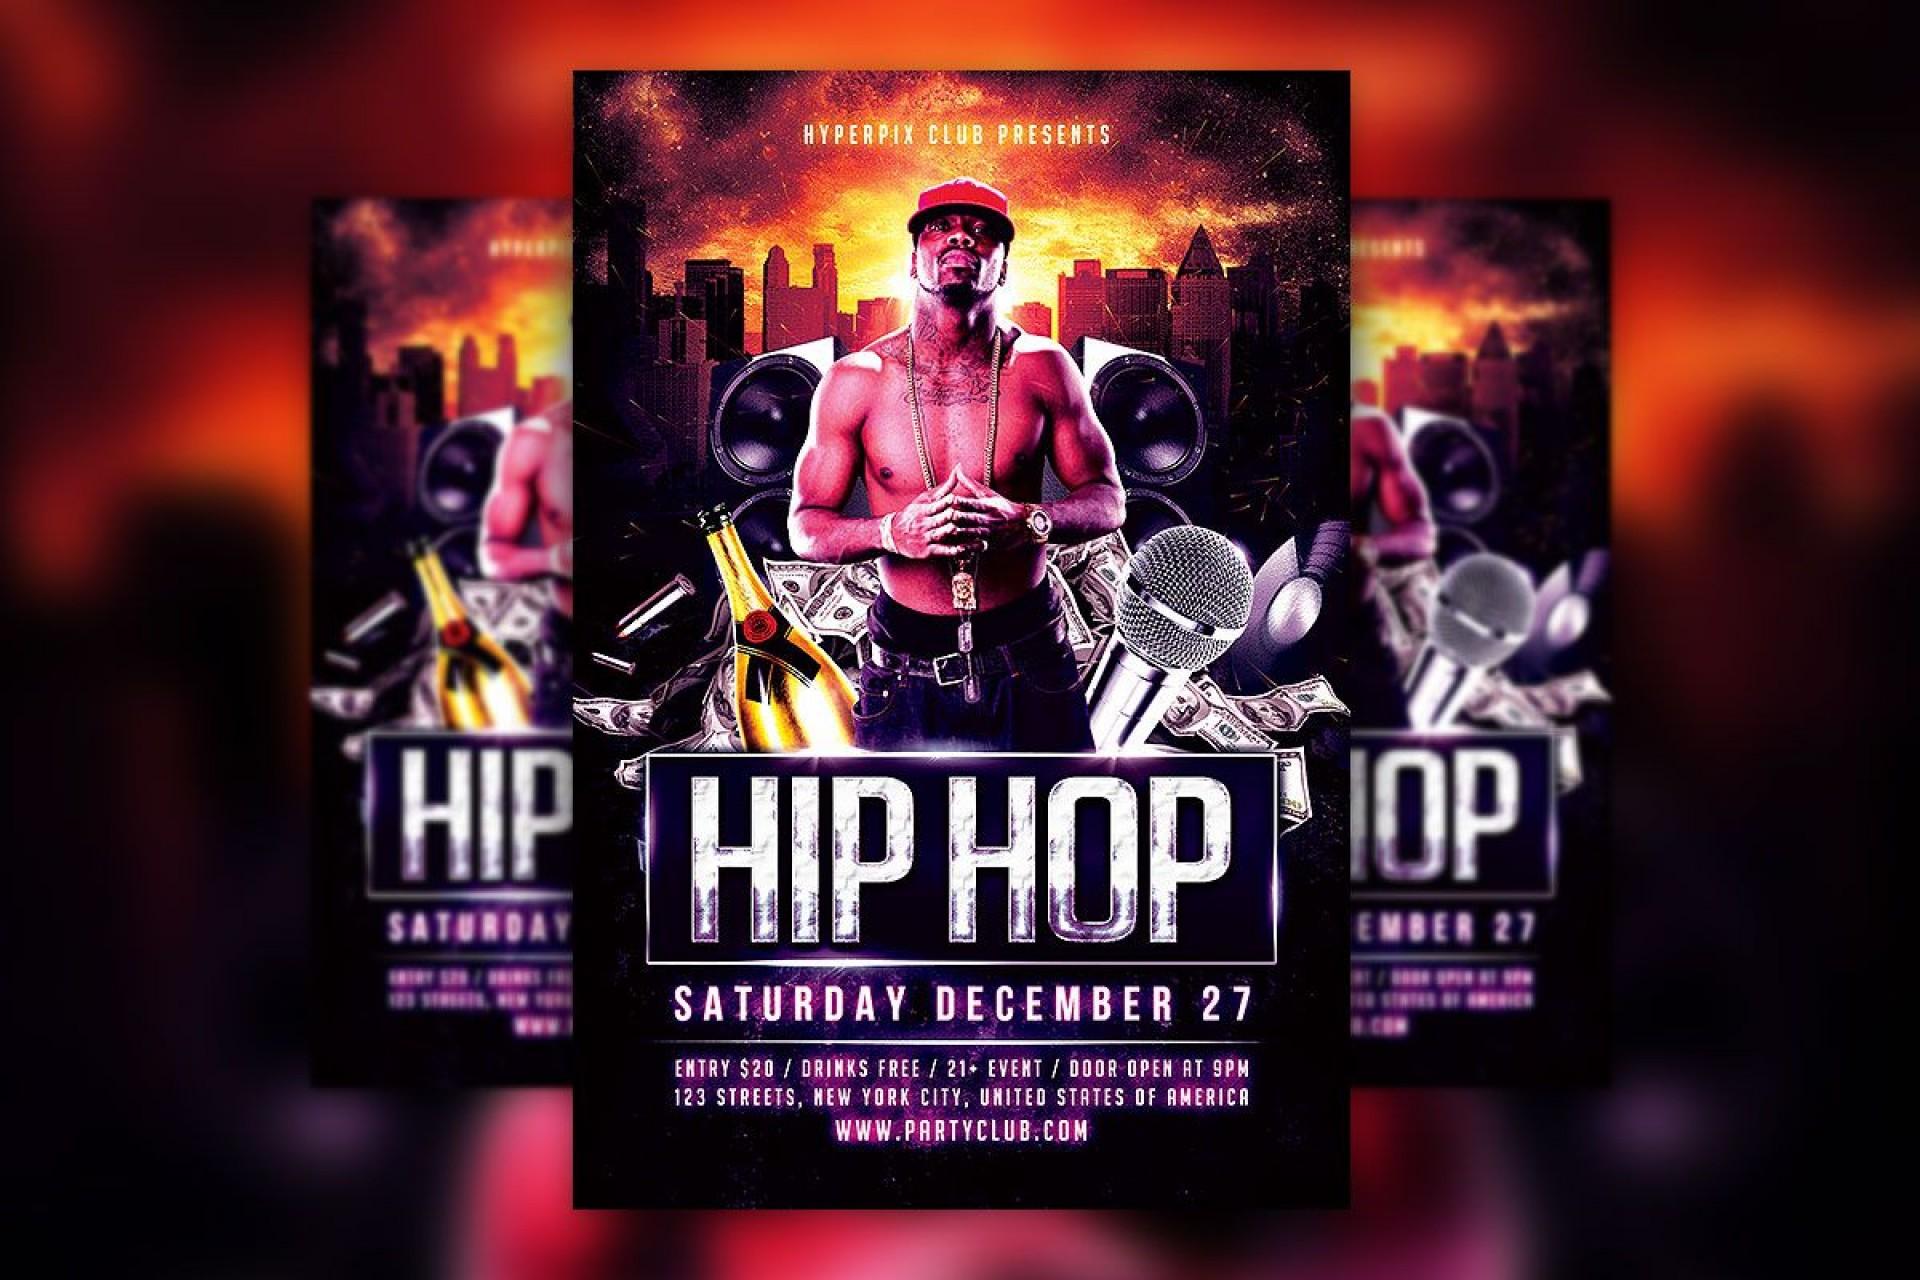 008 Incredible Hip Hop Flyer Template Concept  Templates Hip-hop Party Free Download1920